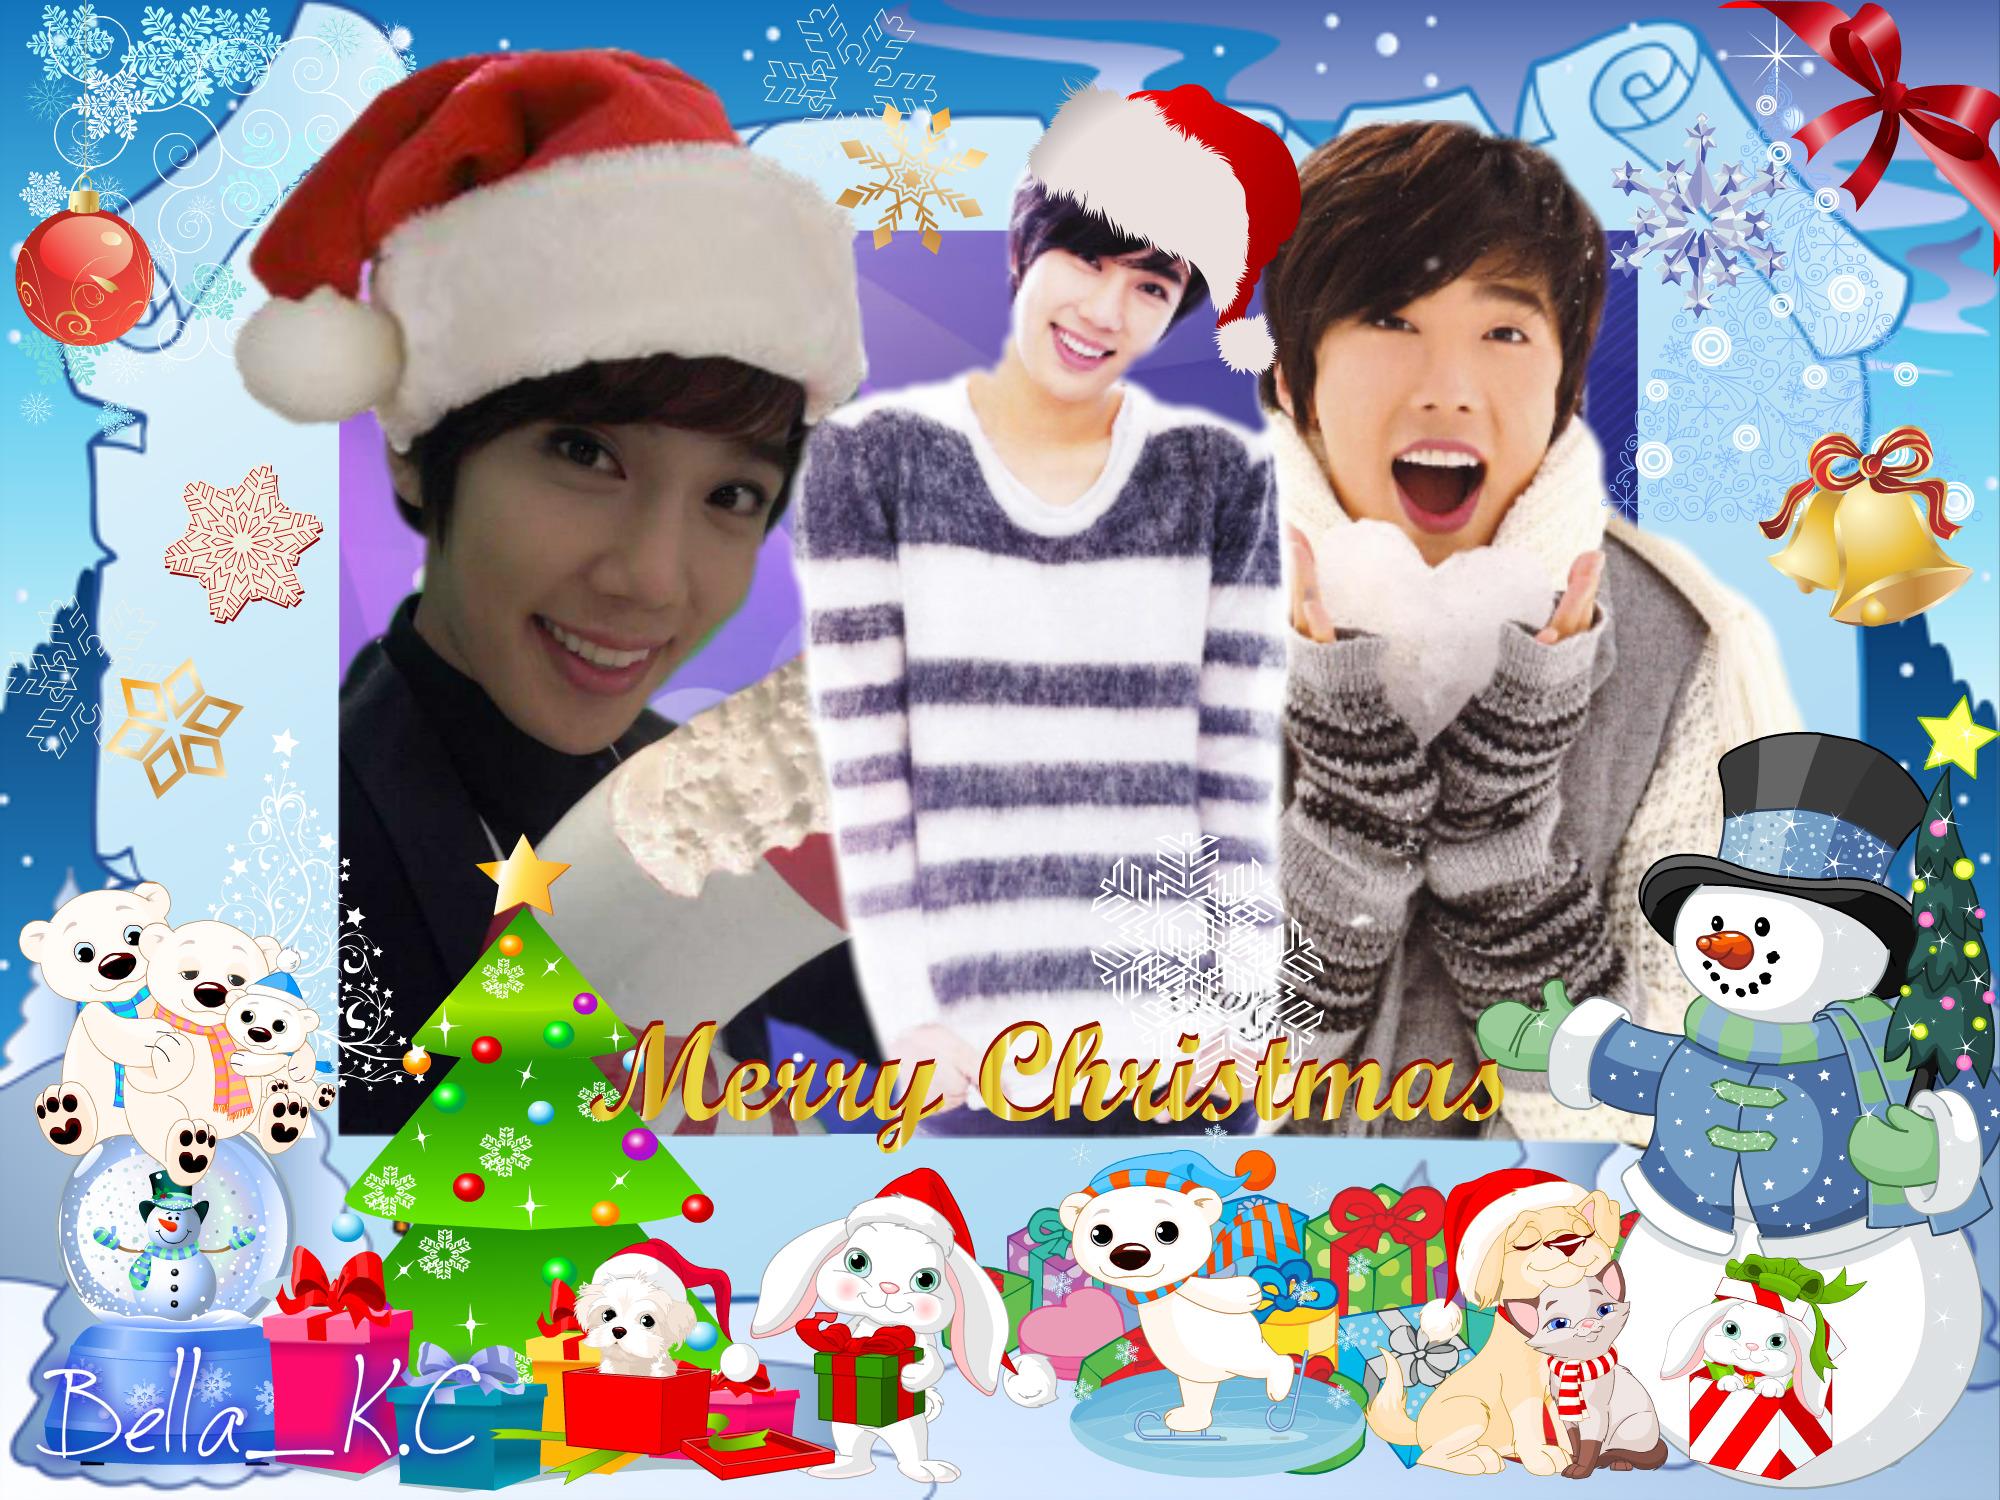 http://s3.picofile.com/file/8229976184/Jung_Min_Christmas.jpg